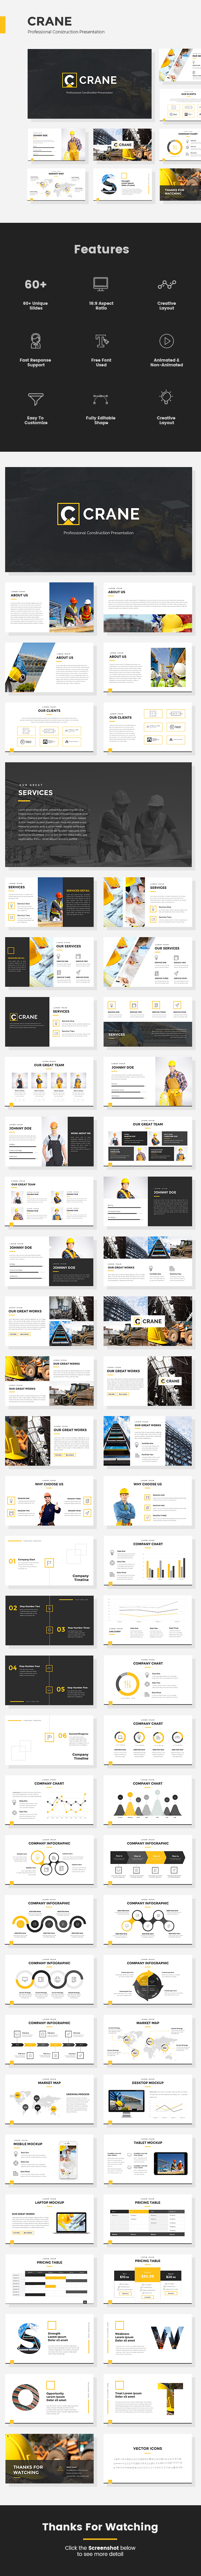 Crane - Professional Construction Google Slides Presentation - Google Slides Presentation Templates